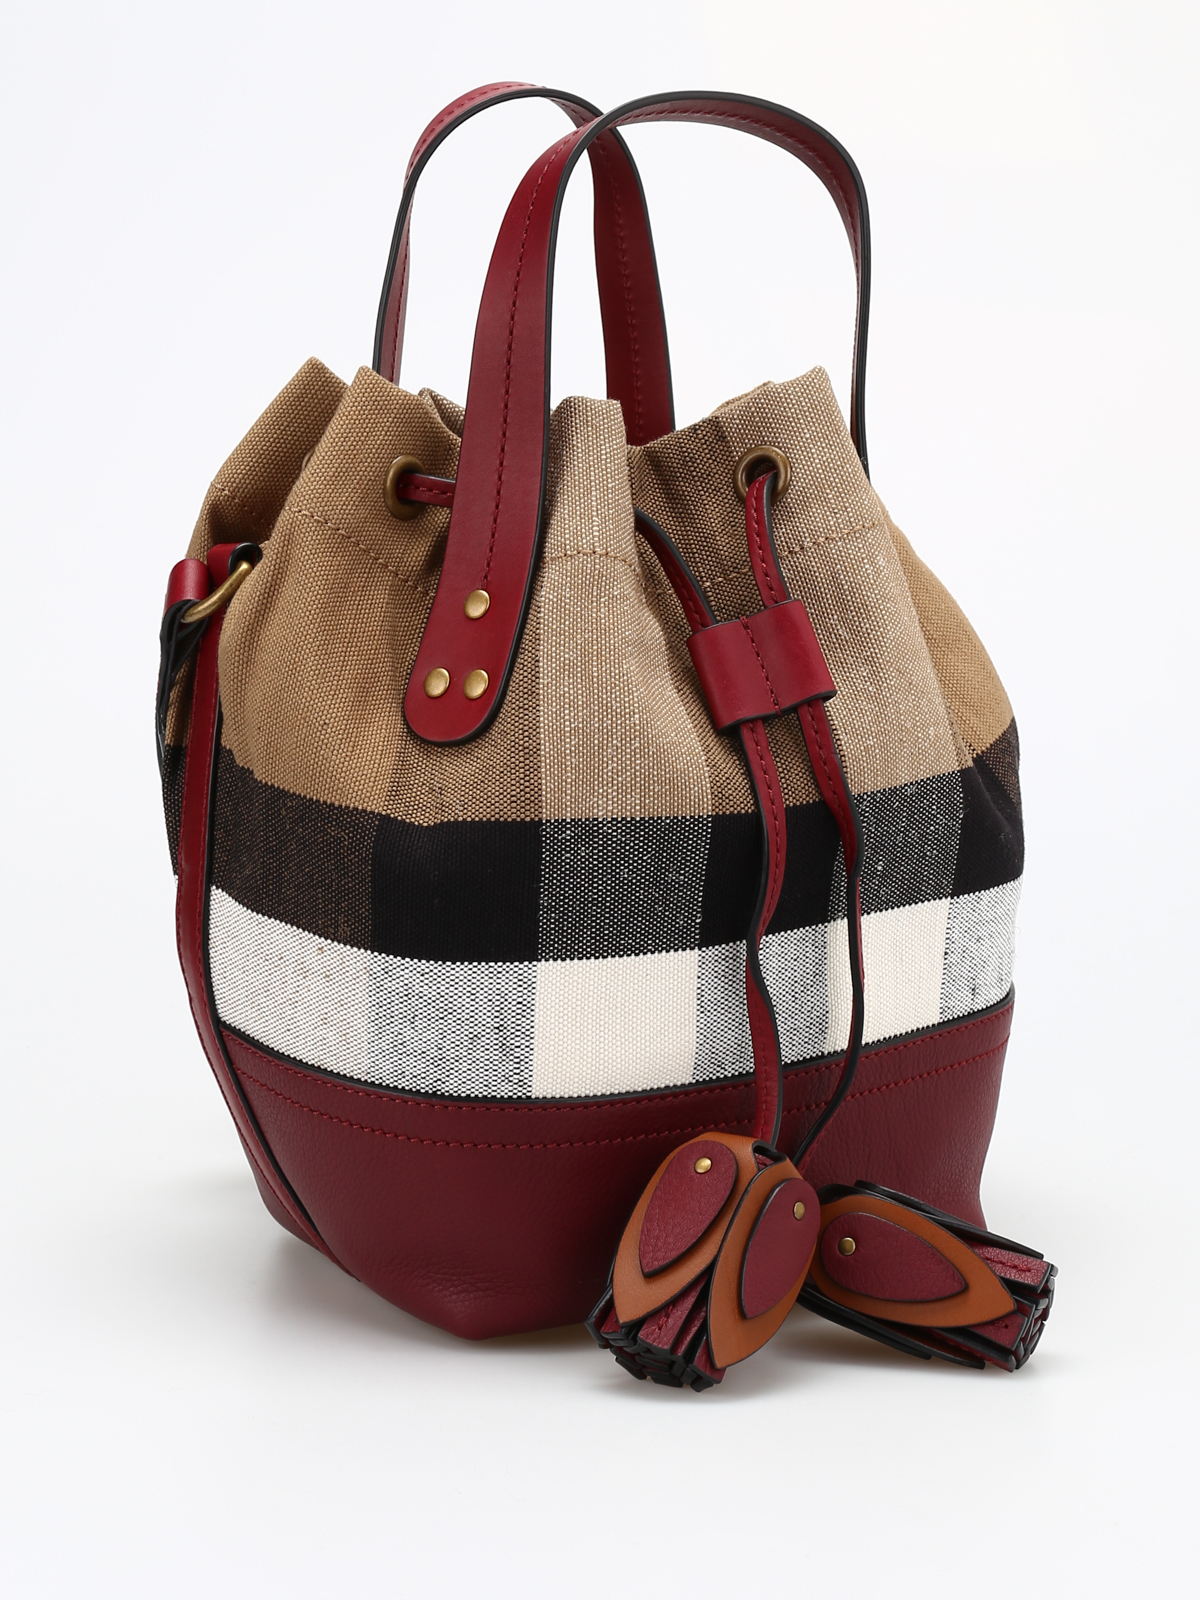 c4db6859b37f Burberry - Small Heston canvas Check bag - Bucket bags - 4053322